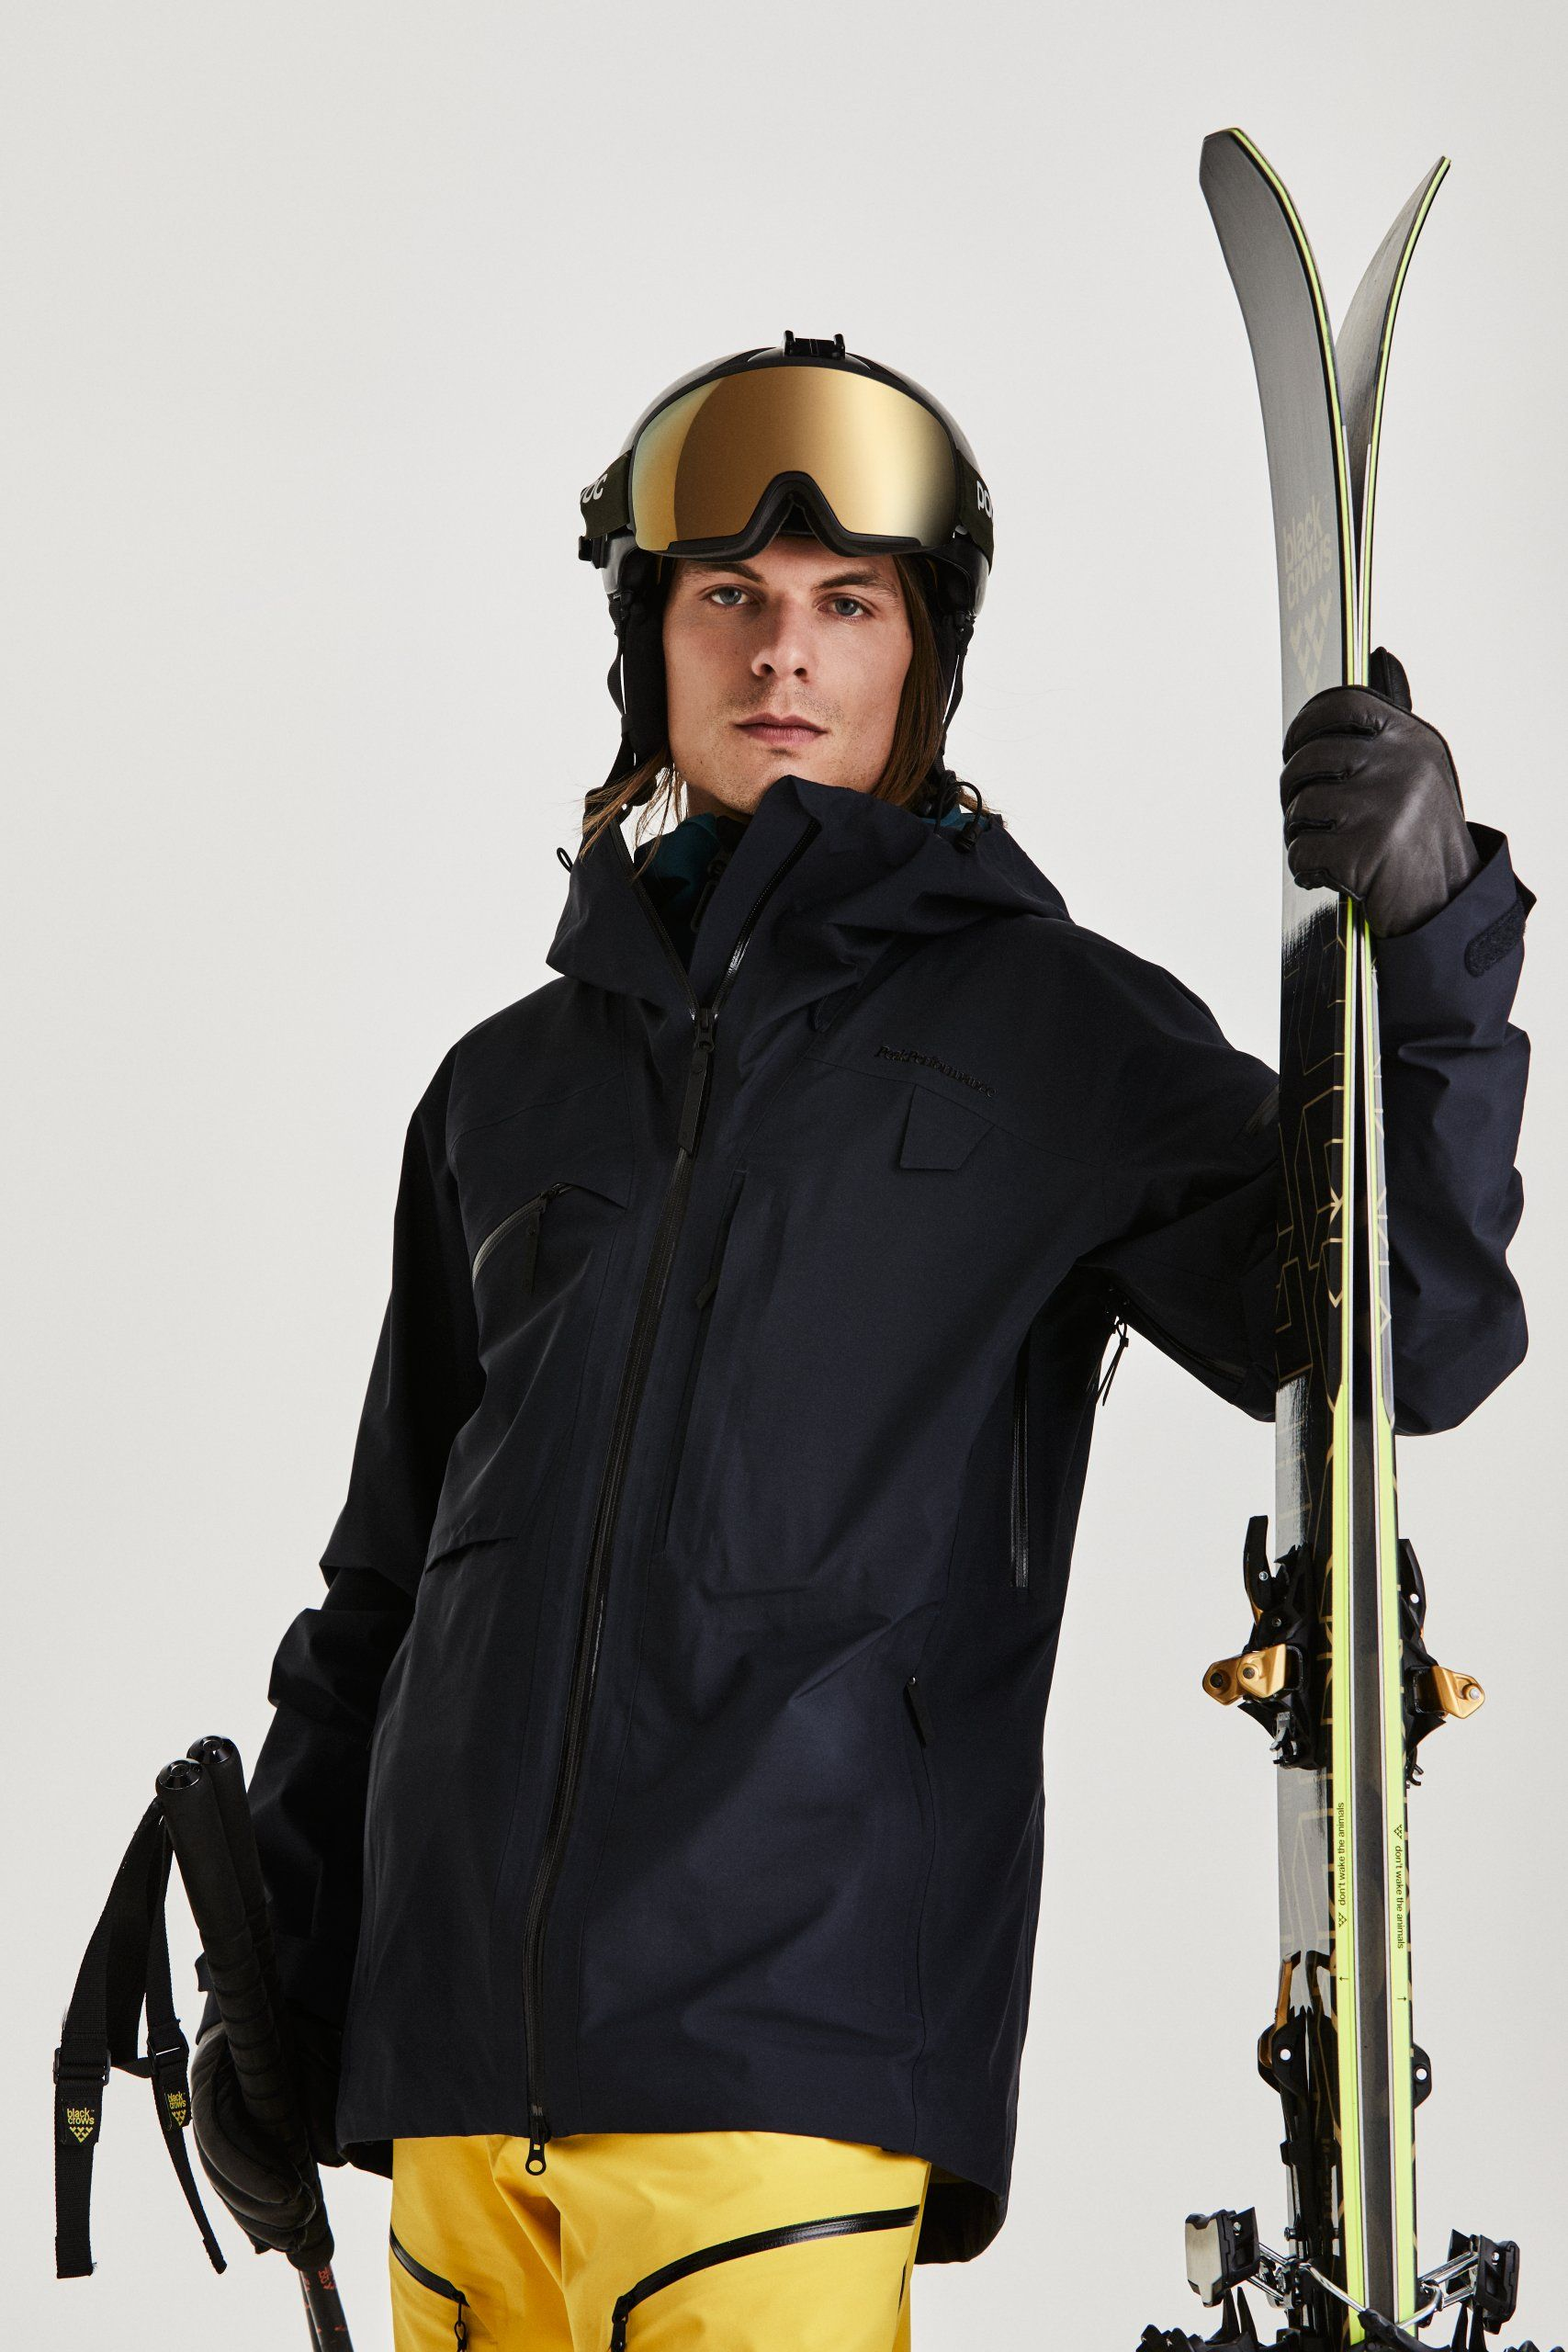 Alpine Ski Jacket: Durability meets comfort in a jacket